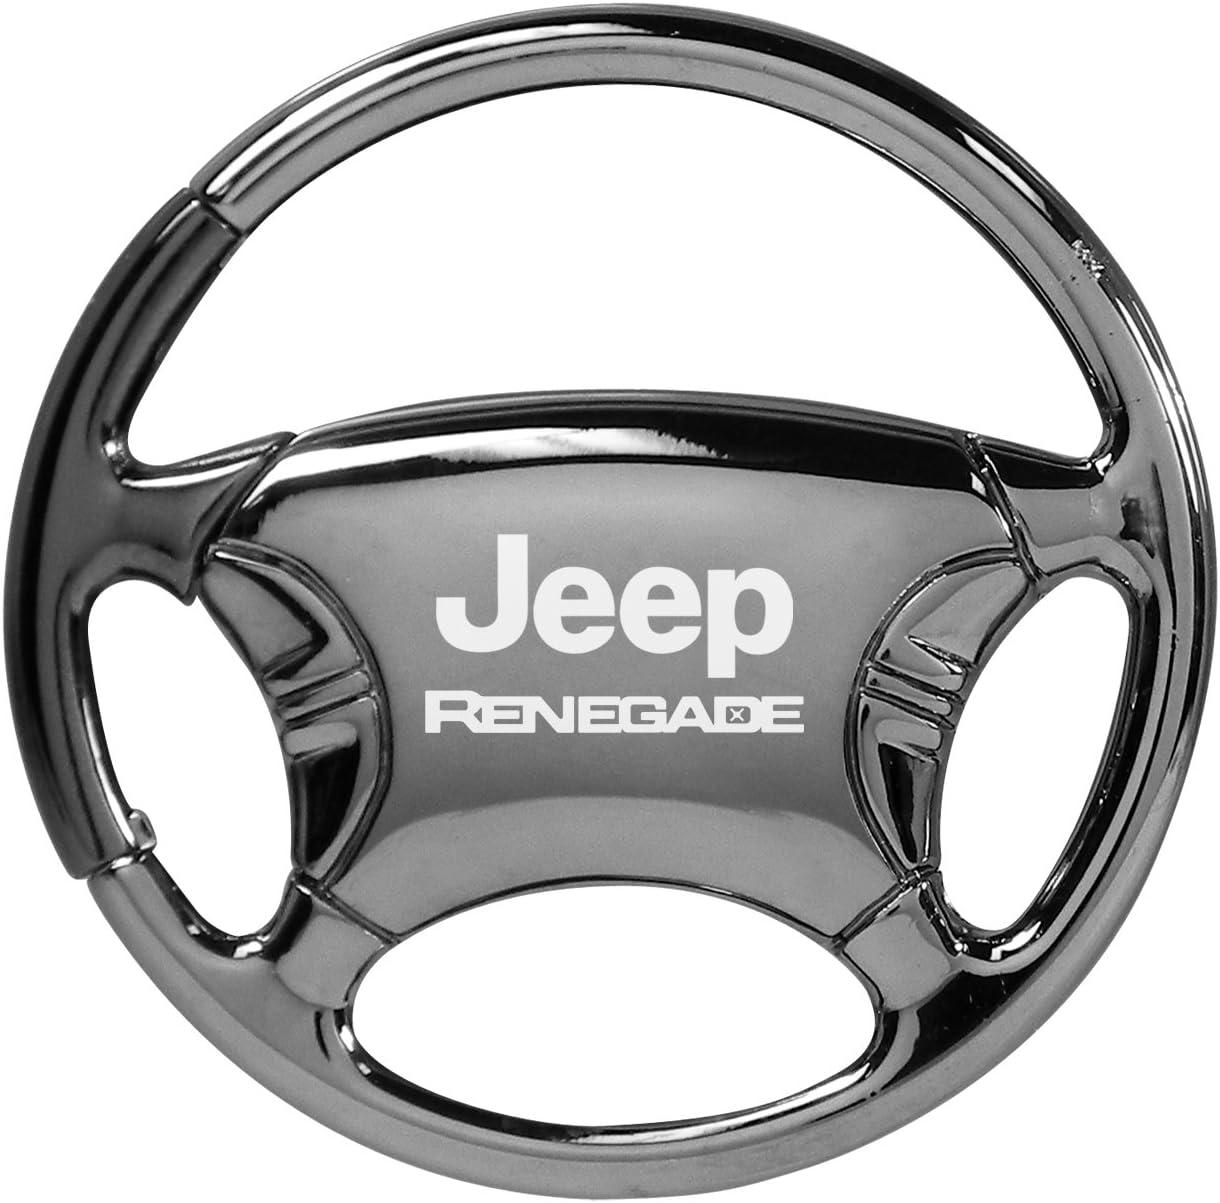 Jeep Rubicon Silver Steering Wheel Key Chain Au-Tomotive Gold INC